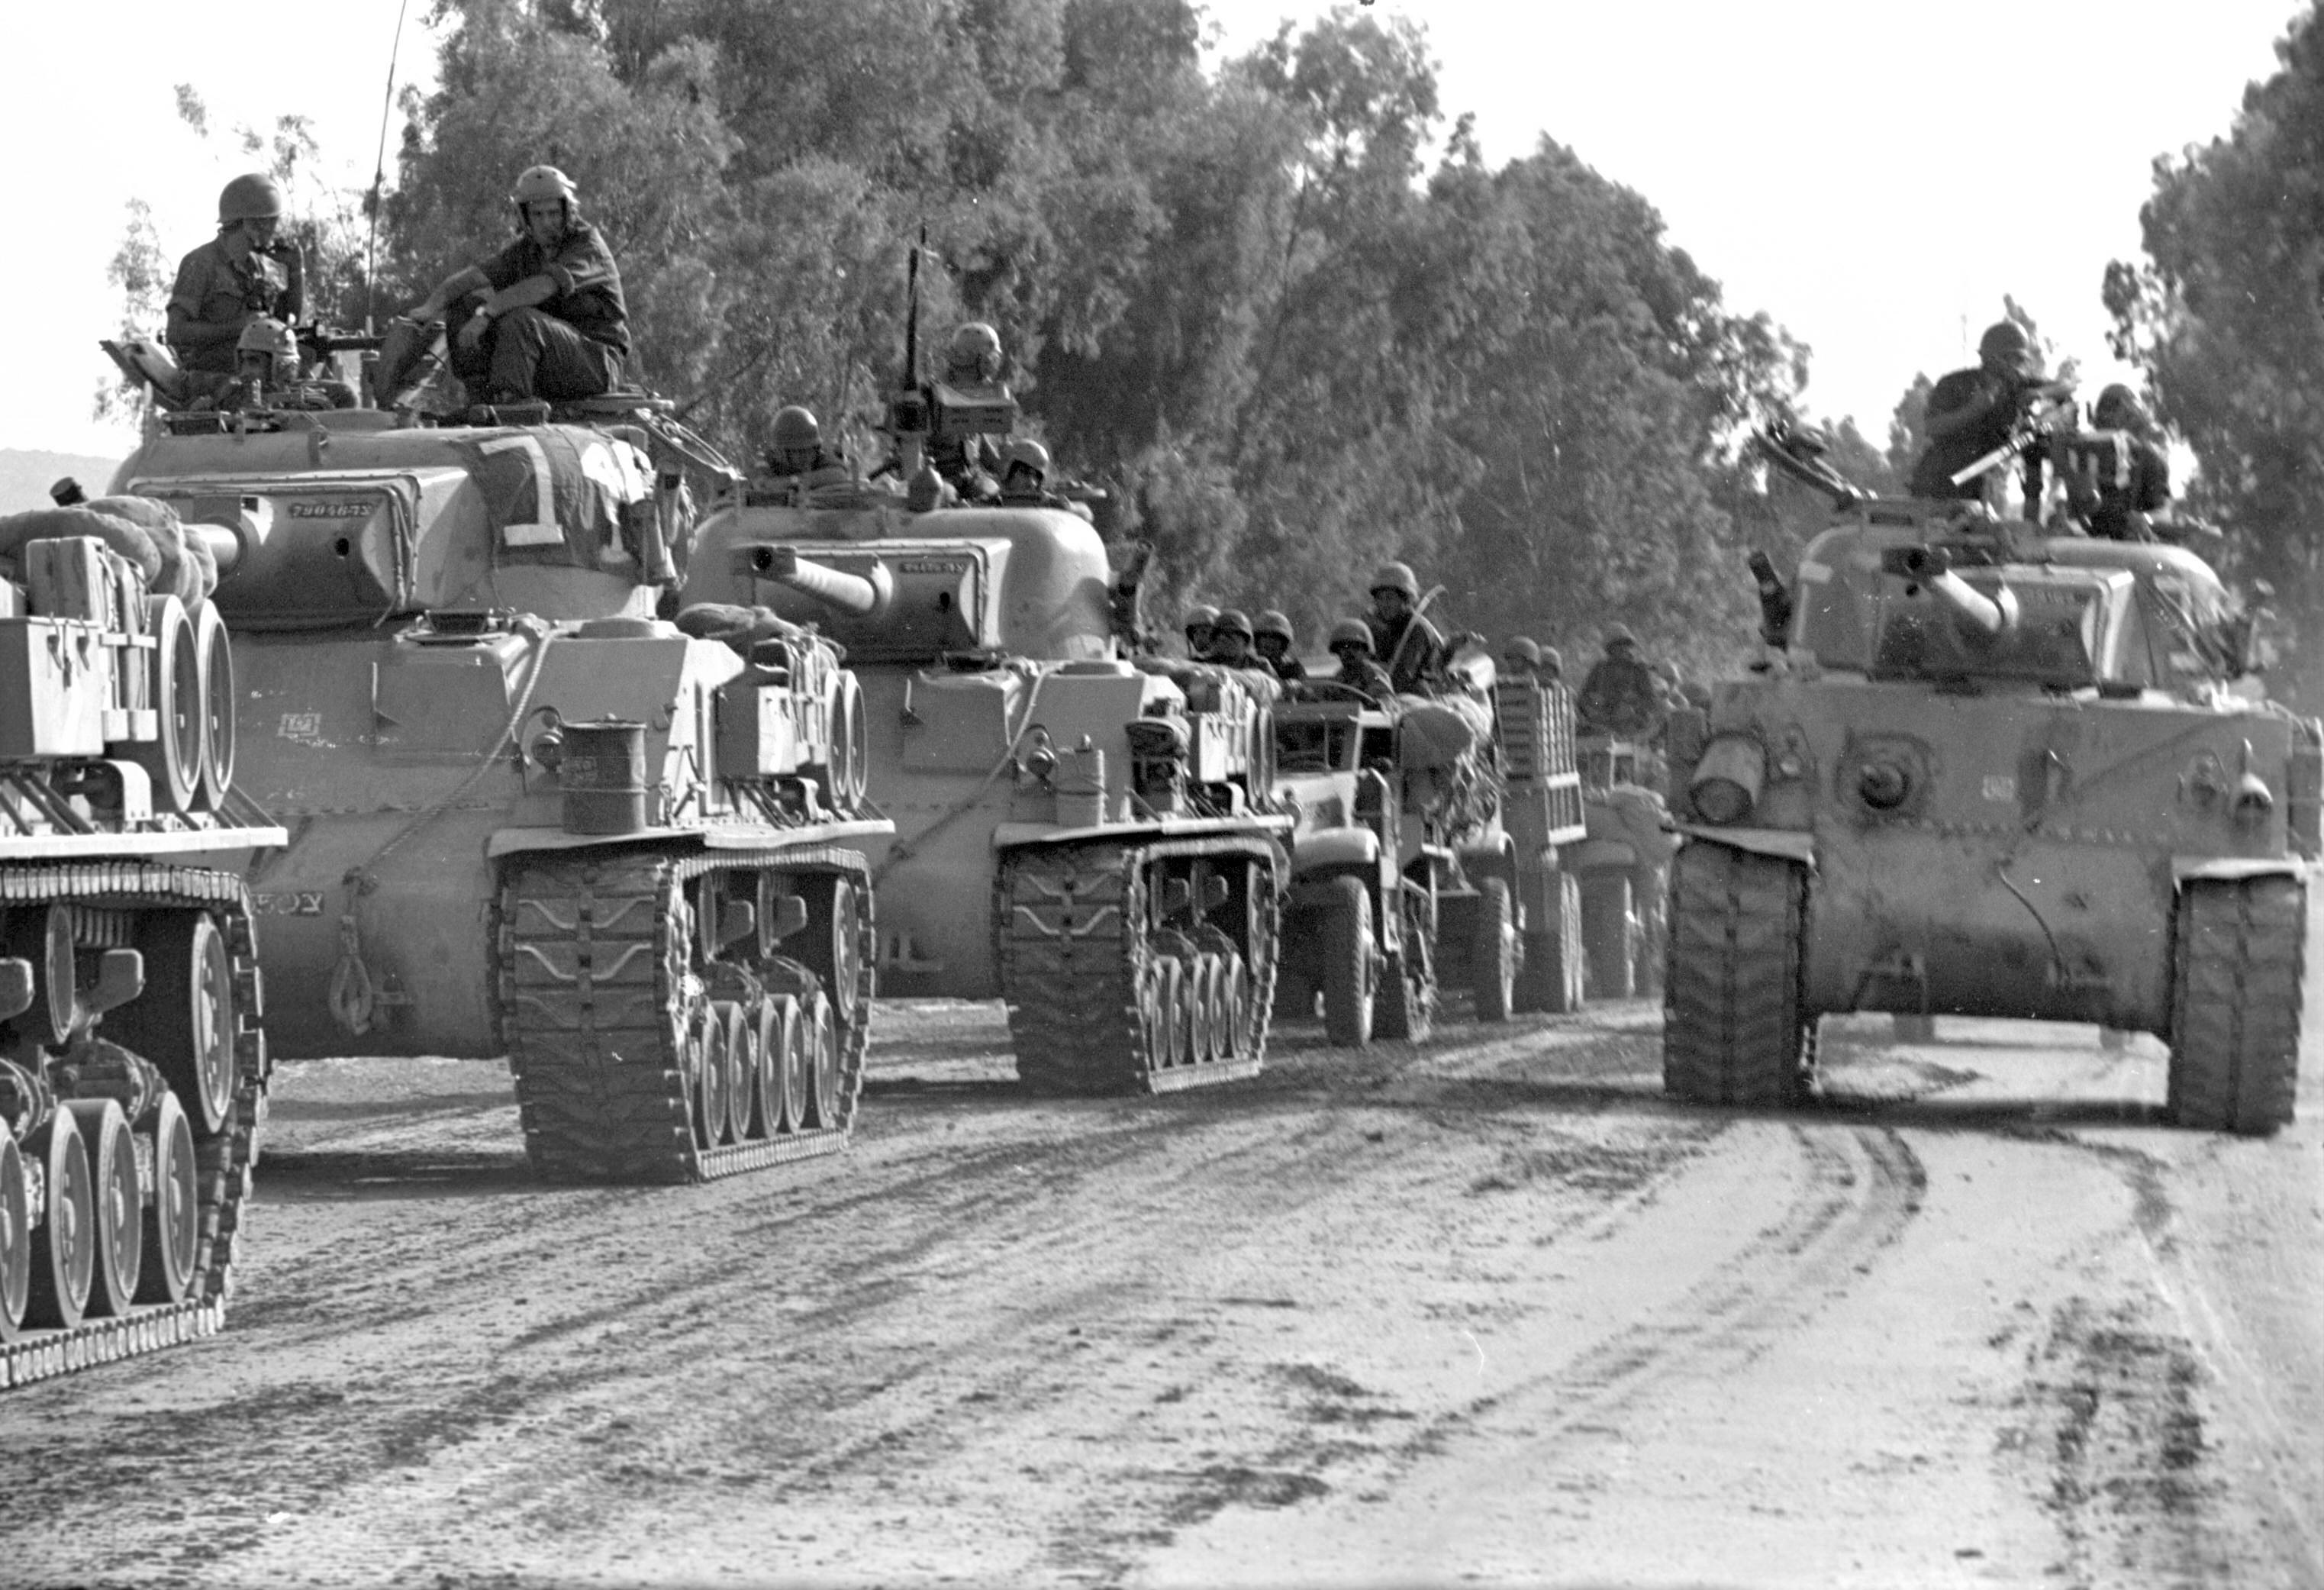 50 Years Legacies Of The 1967 War